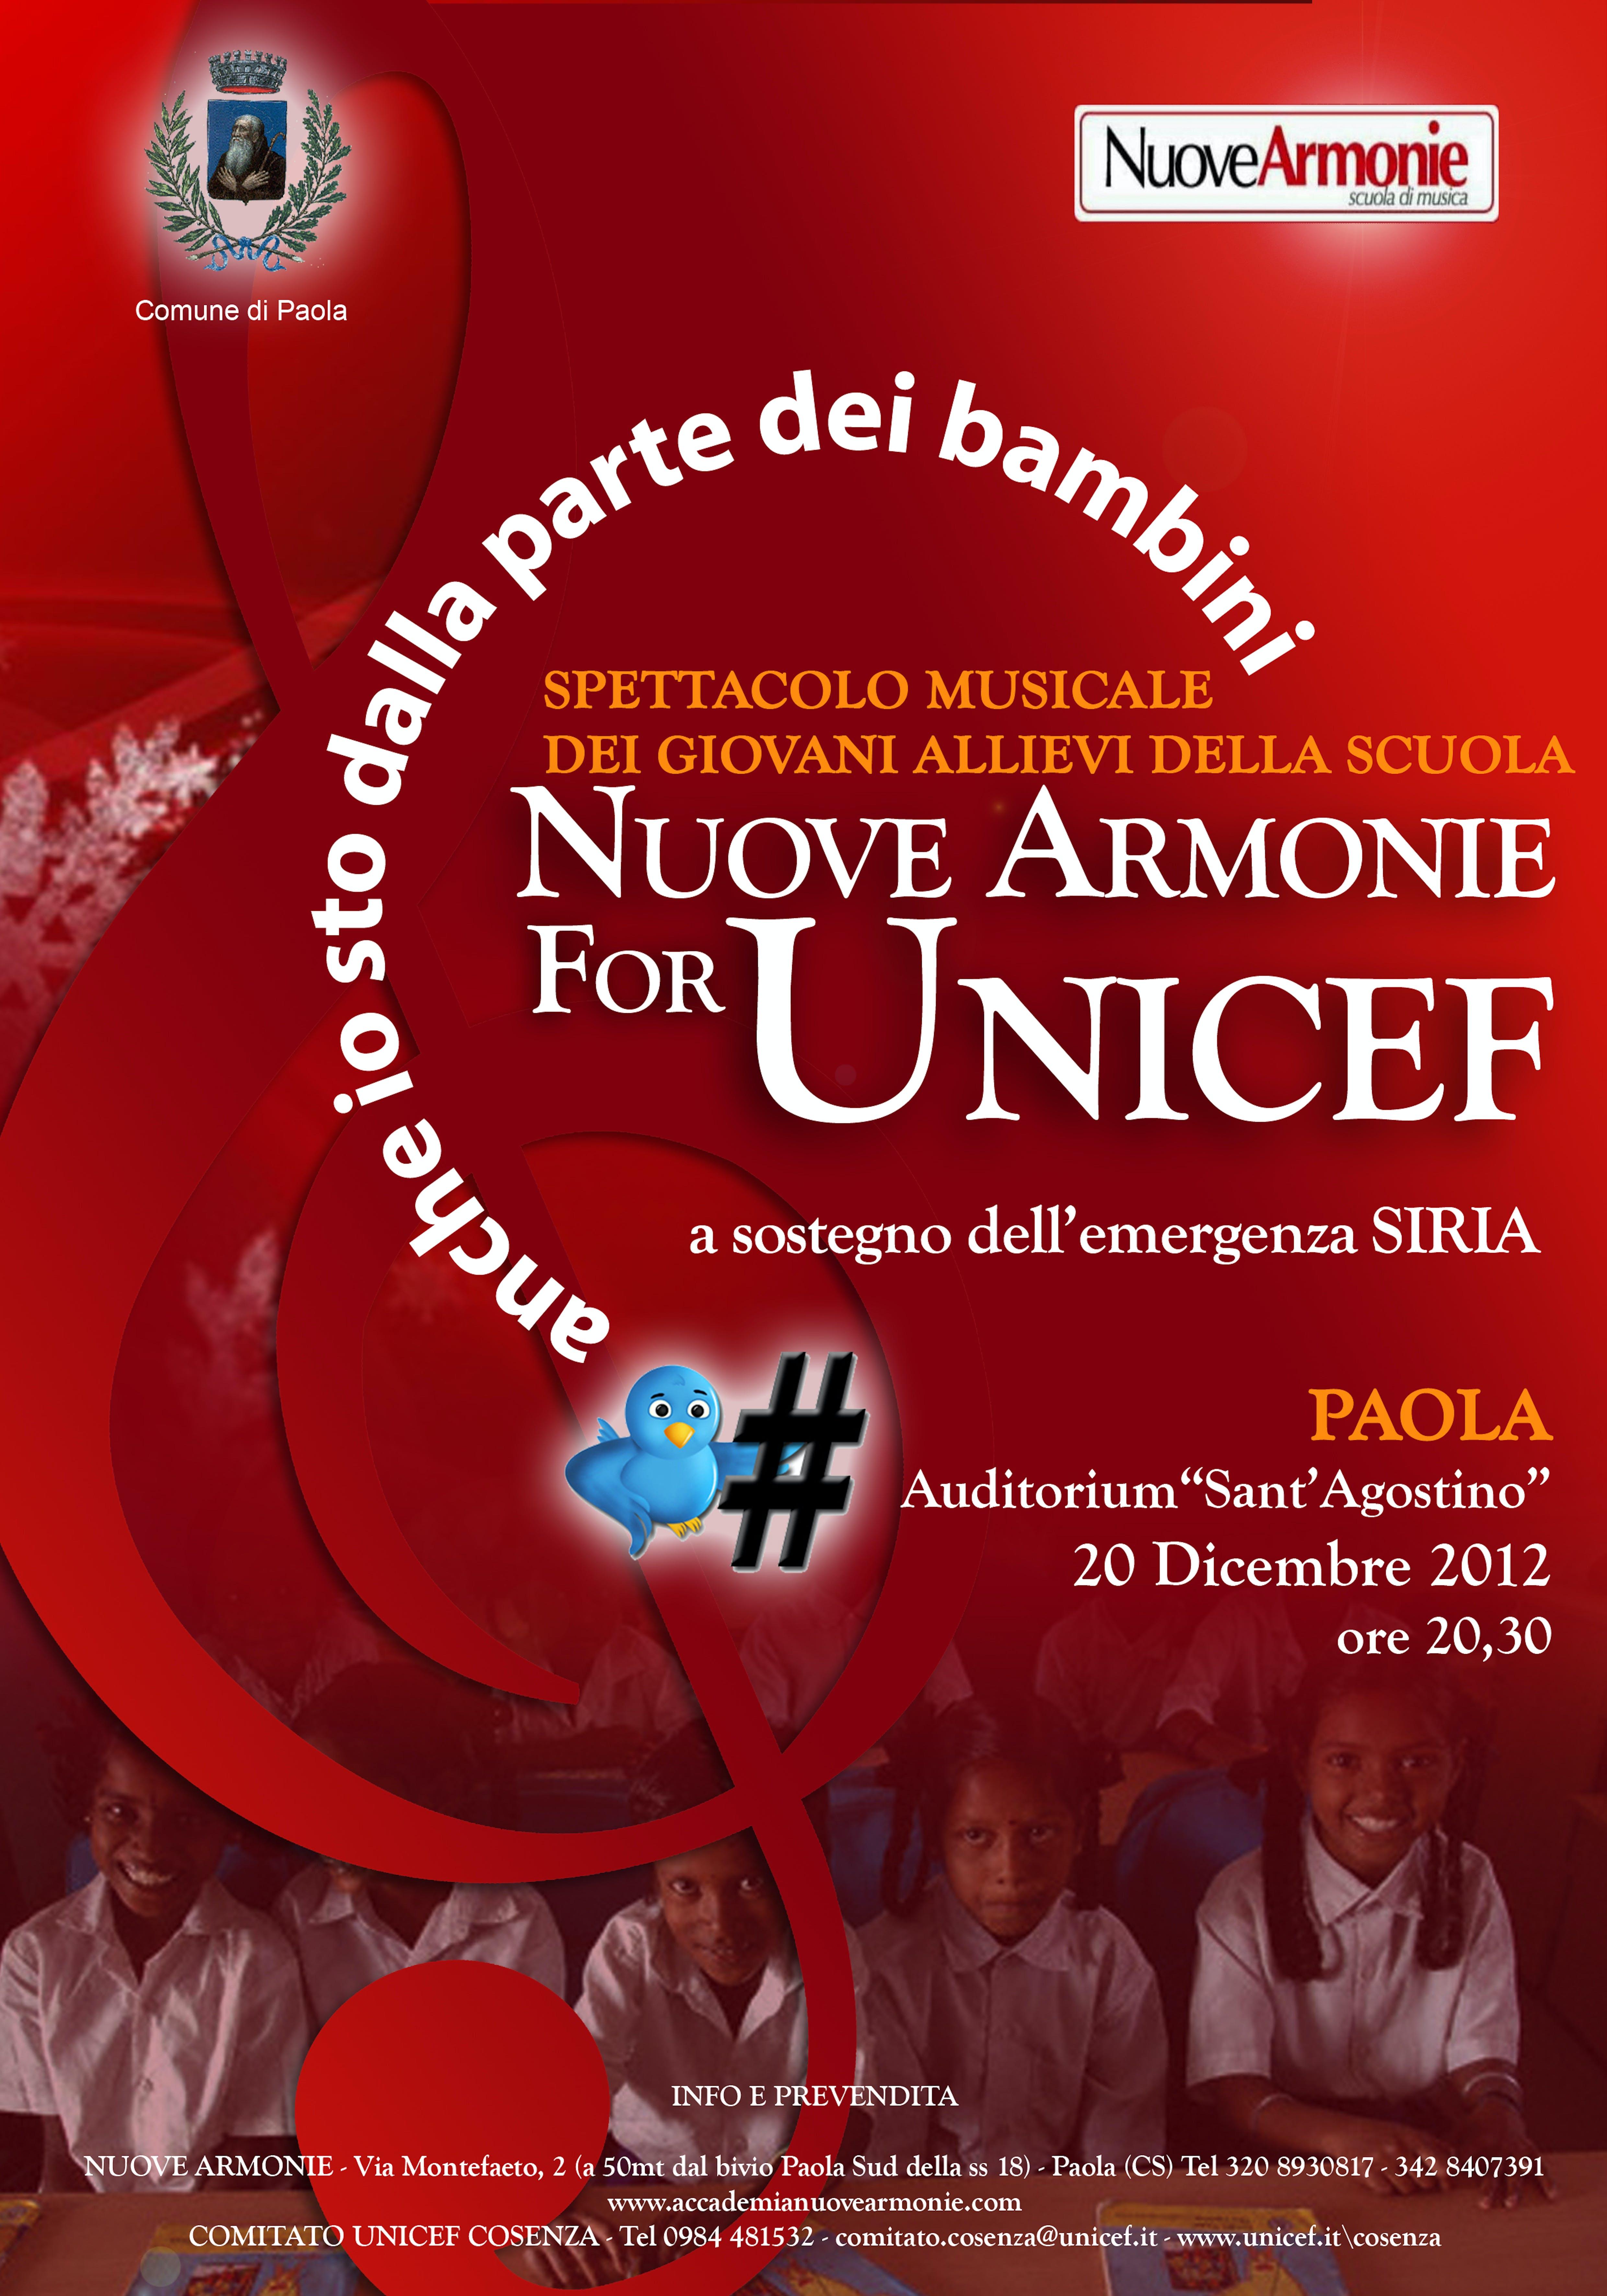 Nuove Armonie for UNICEF, atmosfere natalizie a Paola